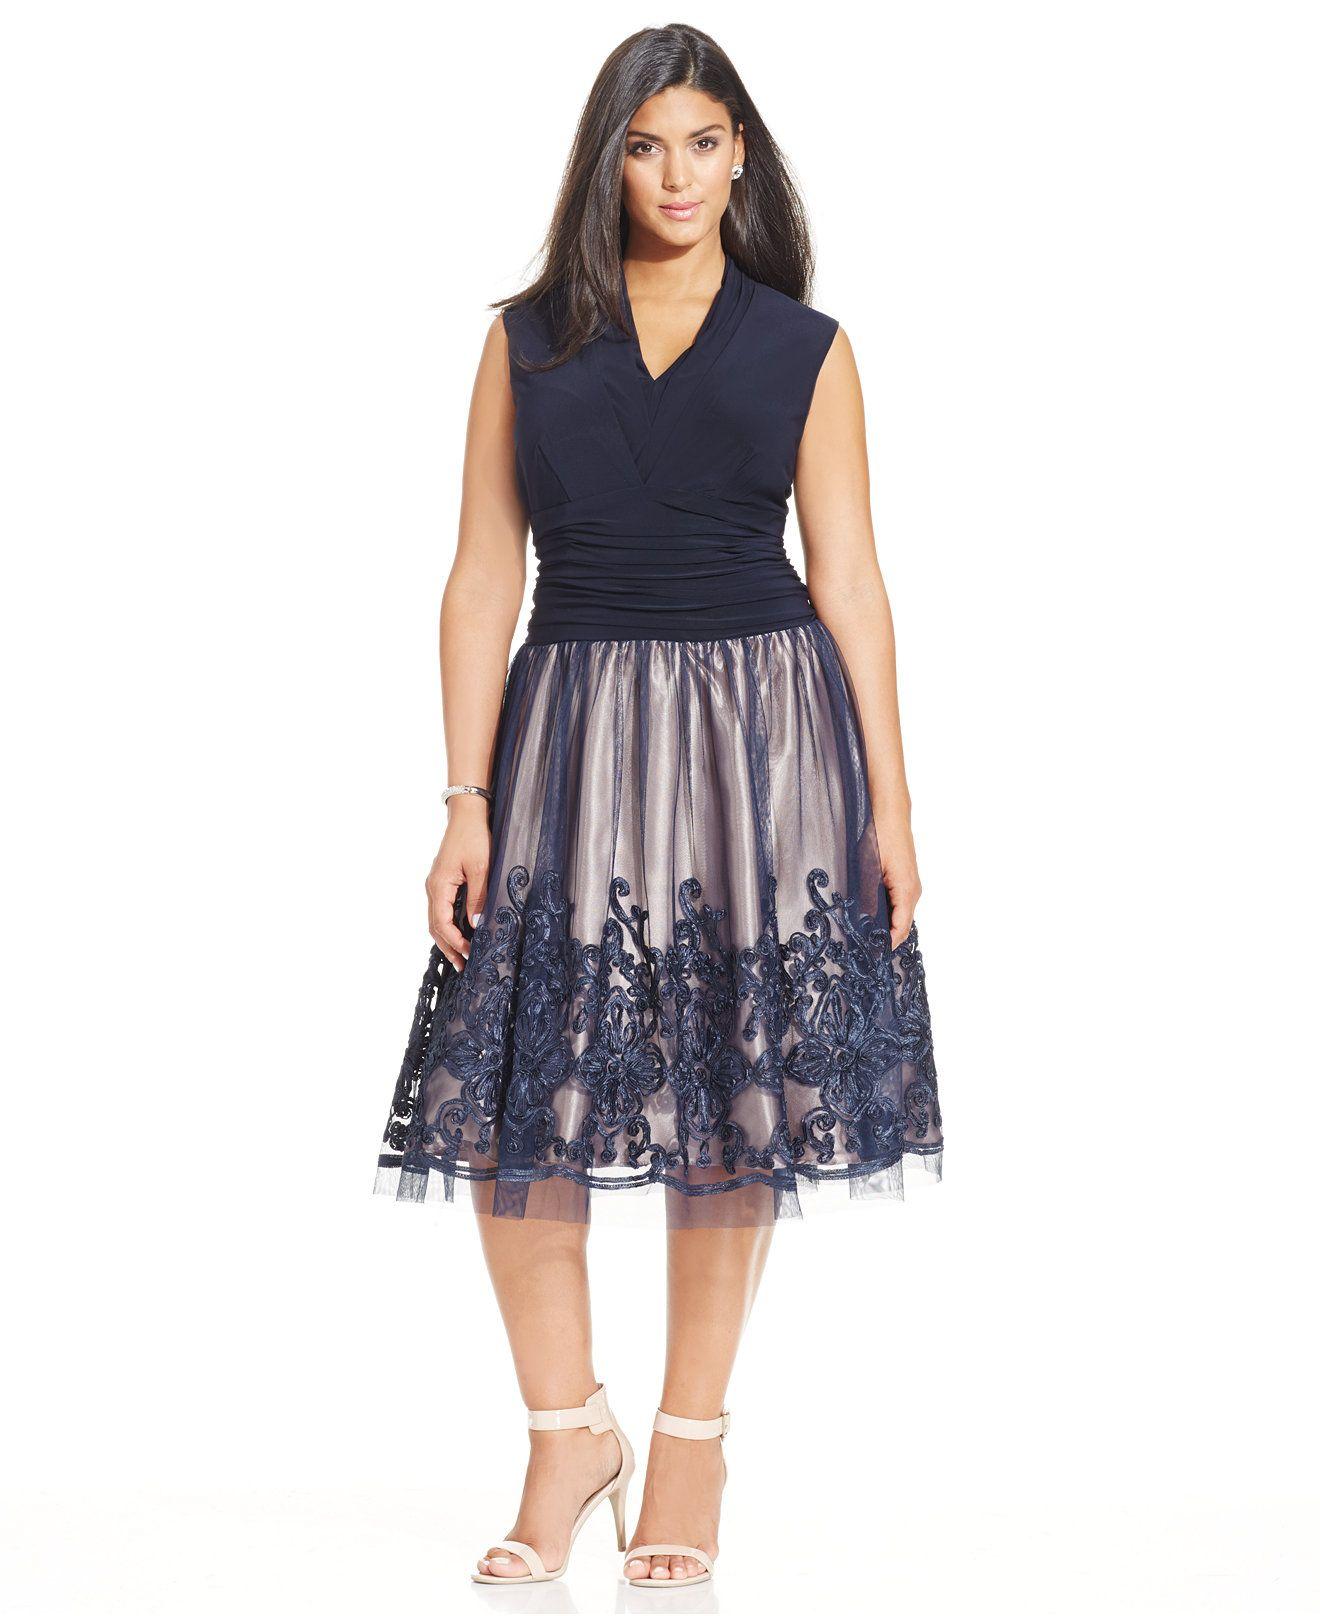 SL Fashions Plus Size Embellished Lace A-Line Dress | Moda, Mode und ...